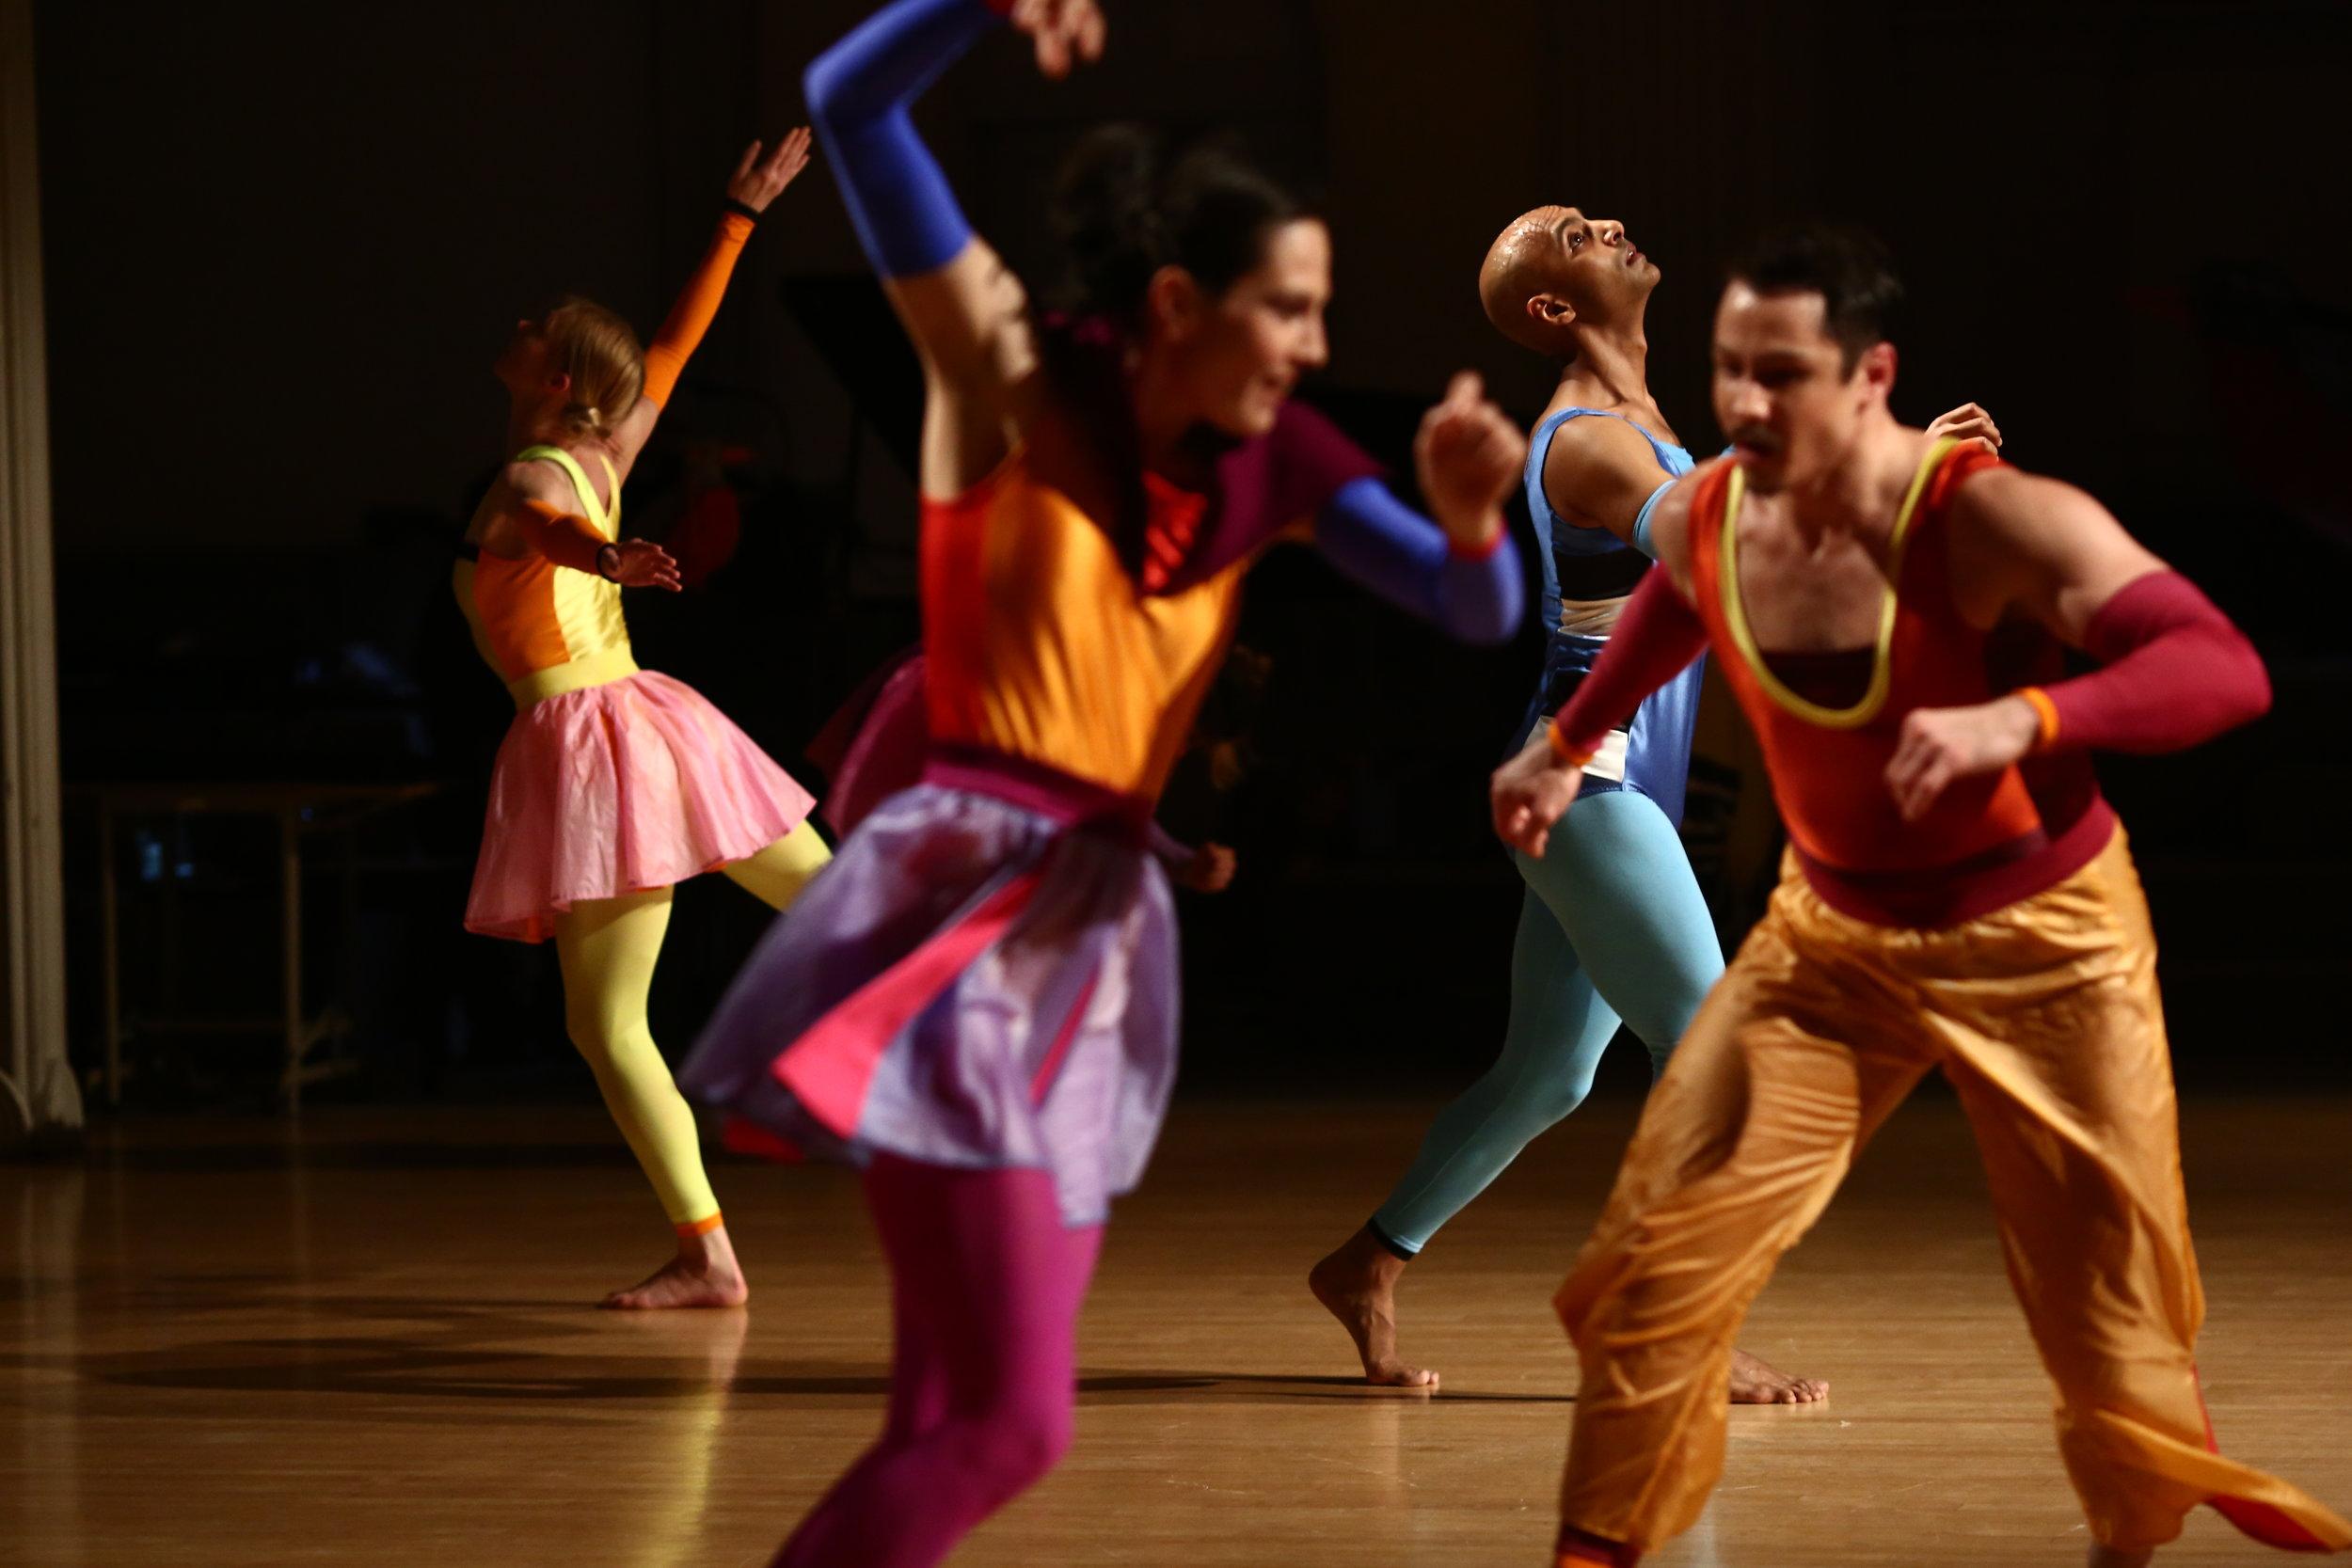 Dancers Left to Right: Emily Pope, Alexandra Berger, Paul Singh, Jake Szczypek, Photo © Paula Court, 2017